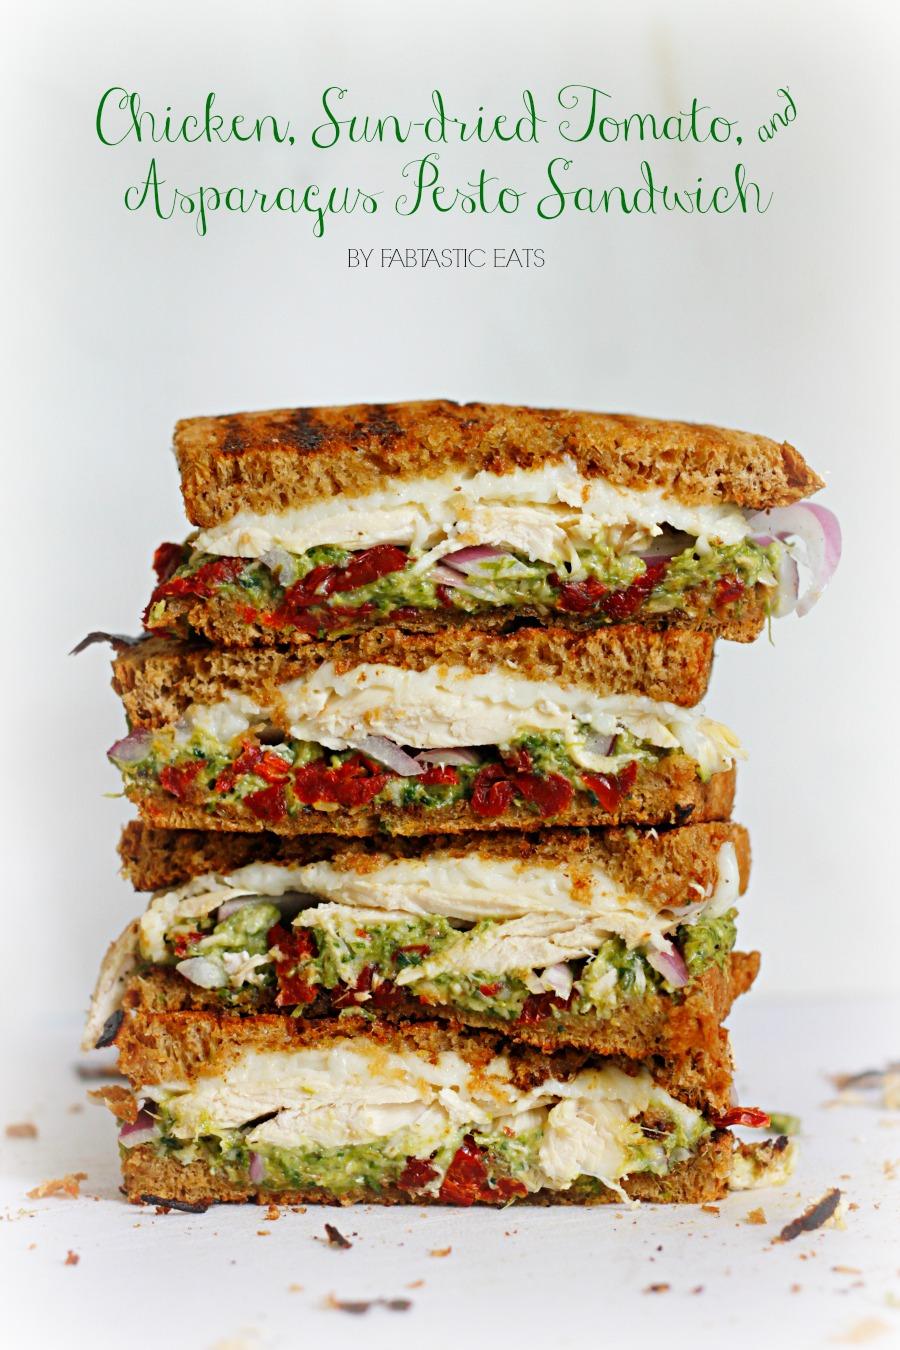 Chicken, Sun-dried Tomato, & Asparagus Pesto Sandwich | Fabtastic Eats